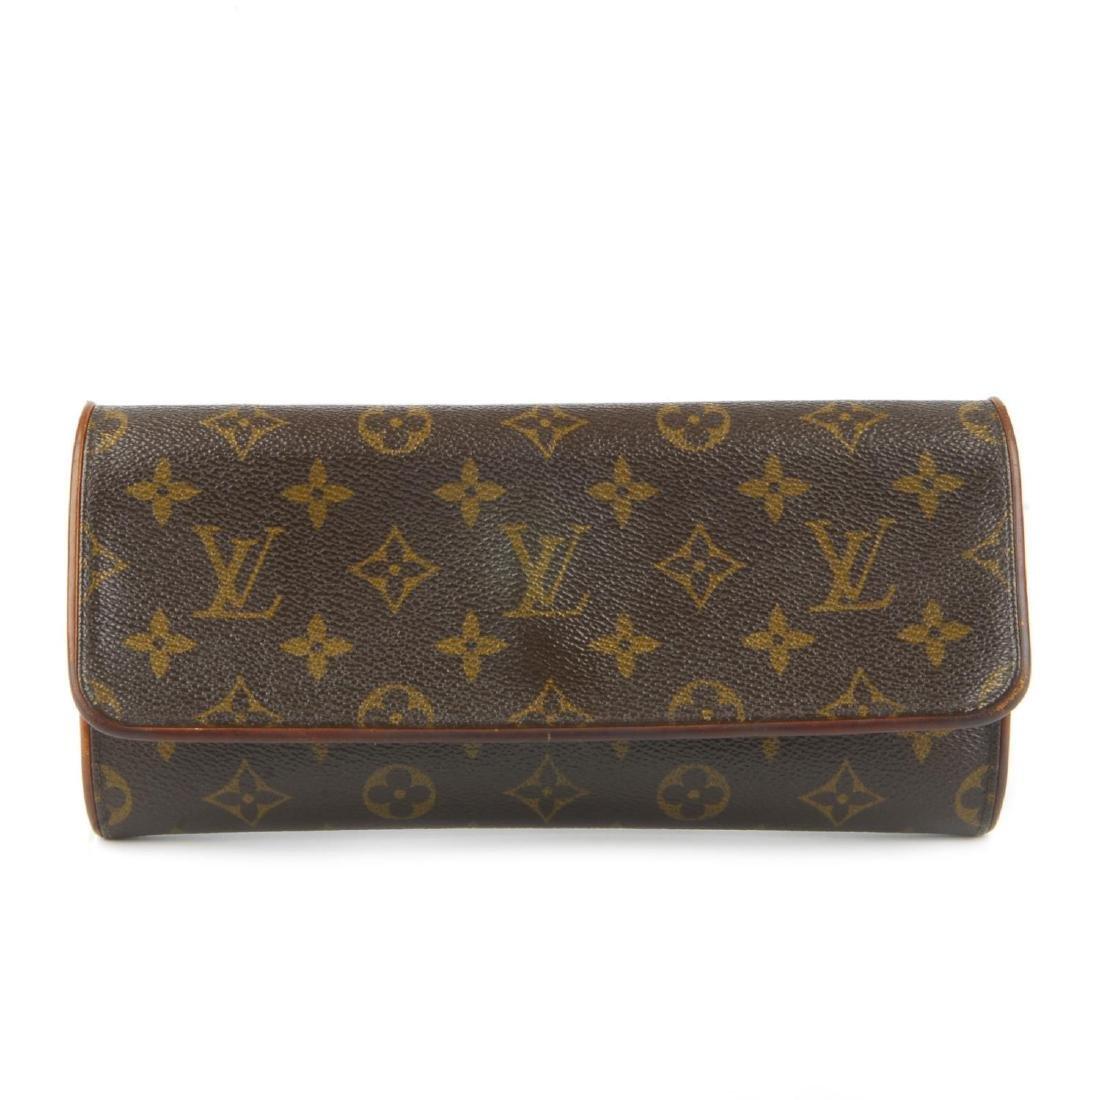 LOUIS VUITTON - a Monogram Pochette Twin GM handbag.